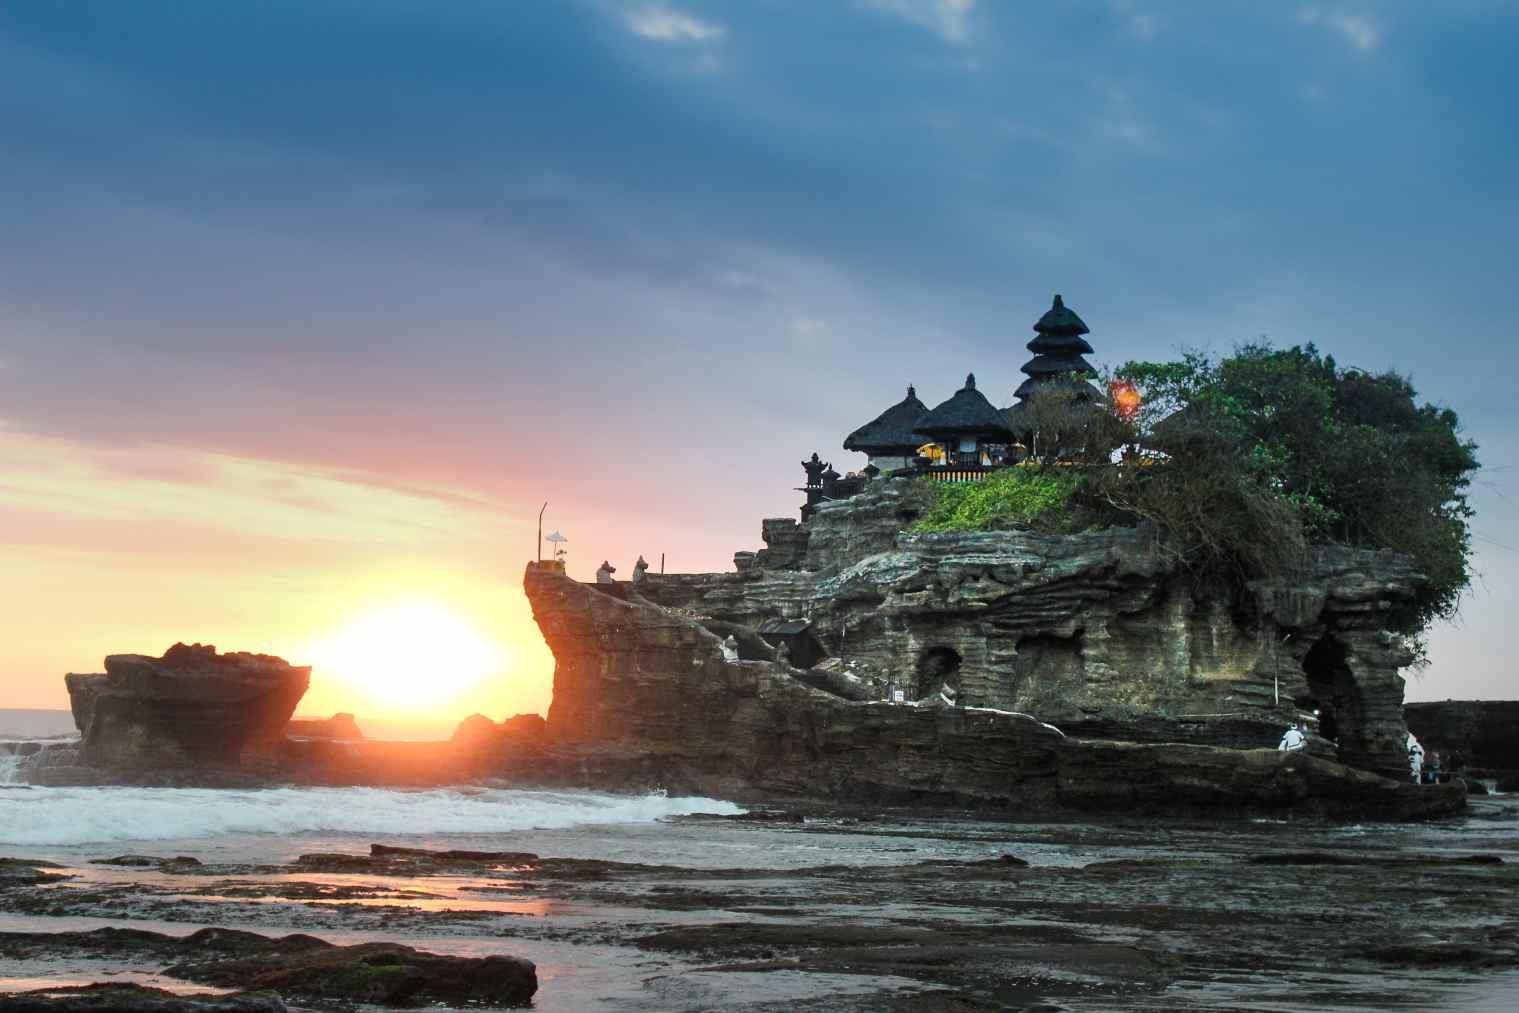 Tanlot Temple in Bali